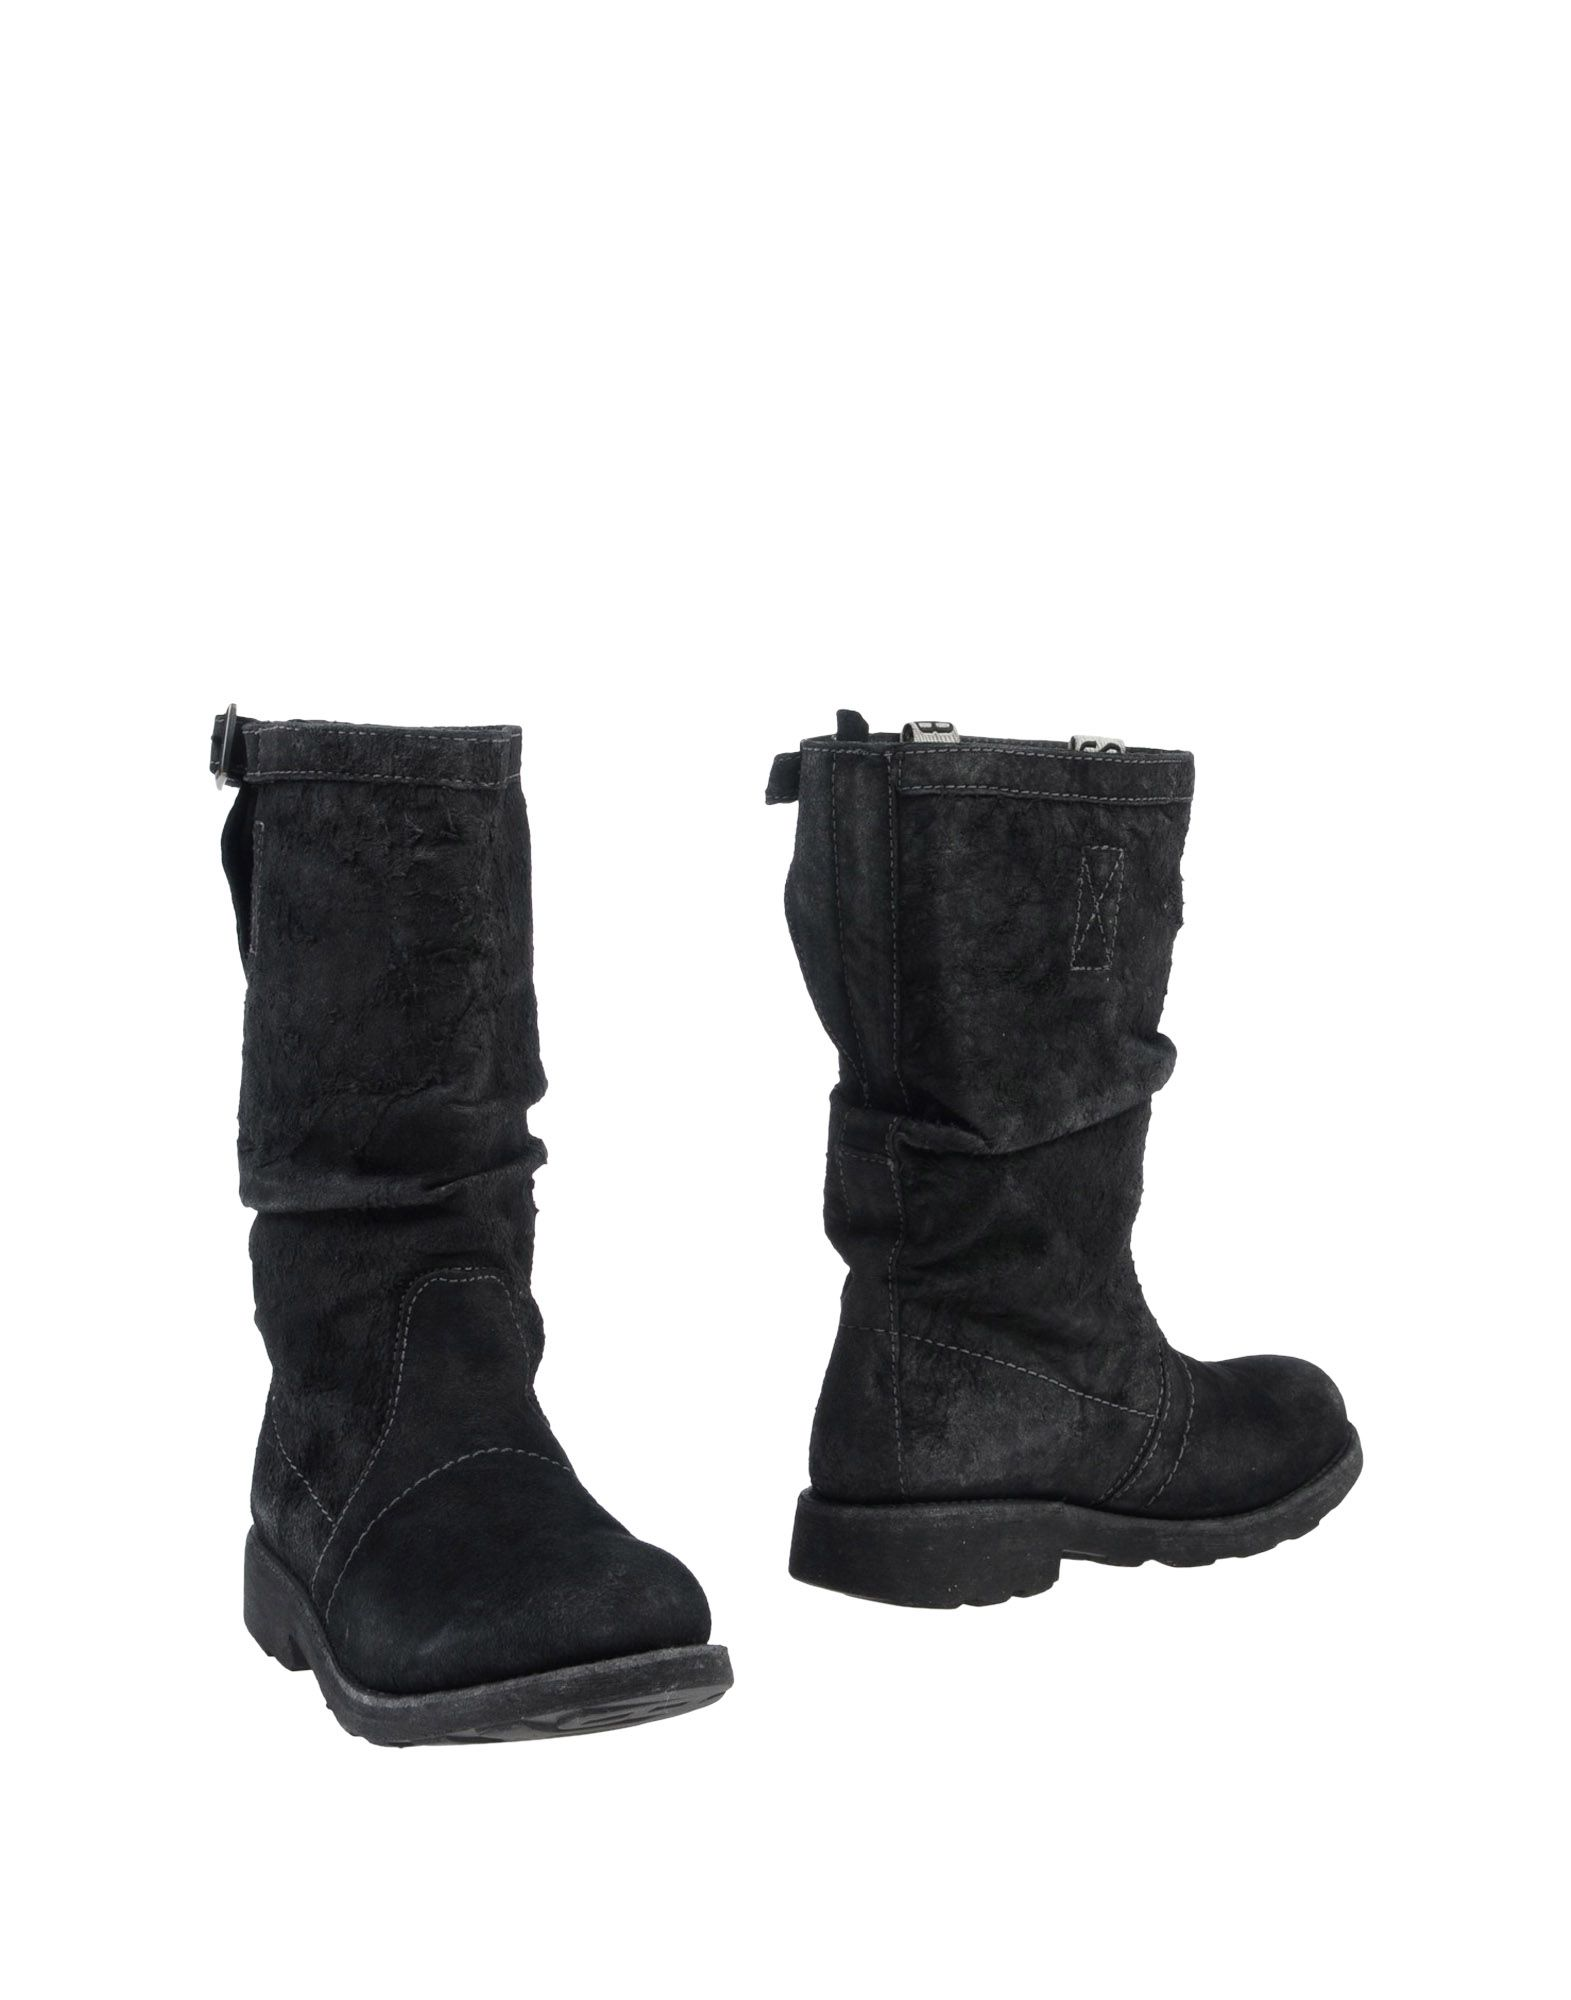 Bikkembergs Boots - Women Bikkembergs Australia Boots online on  Australia Bikkembergs - 11417872WM dbb147